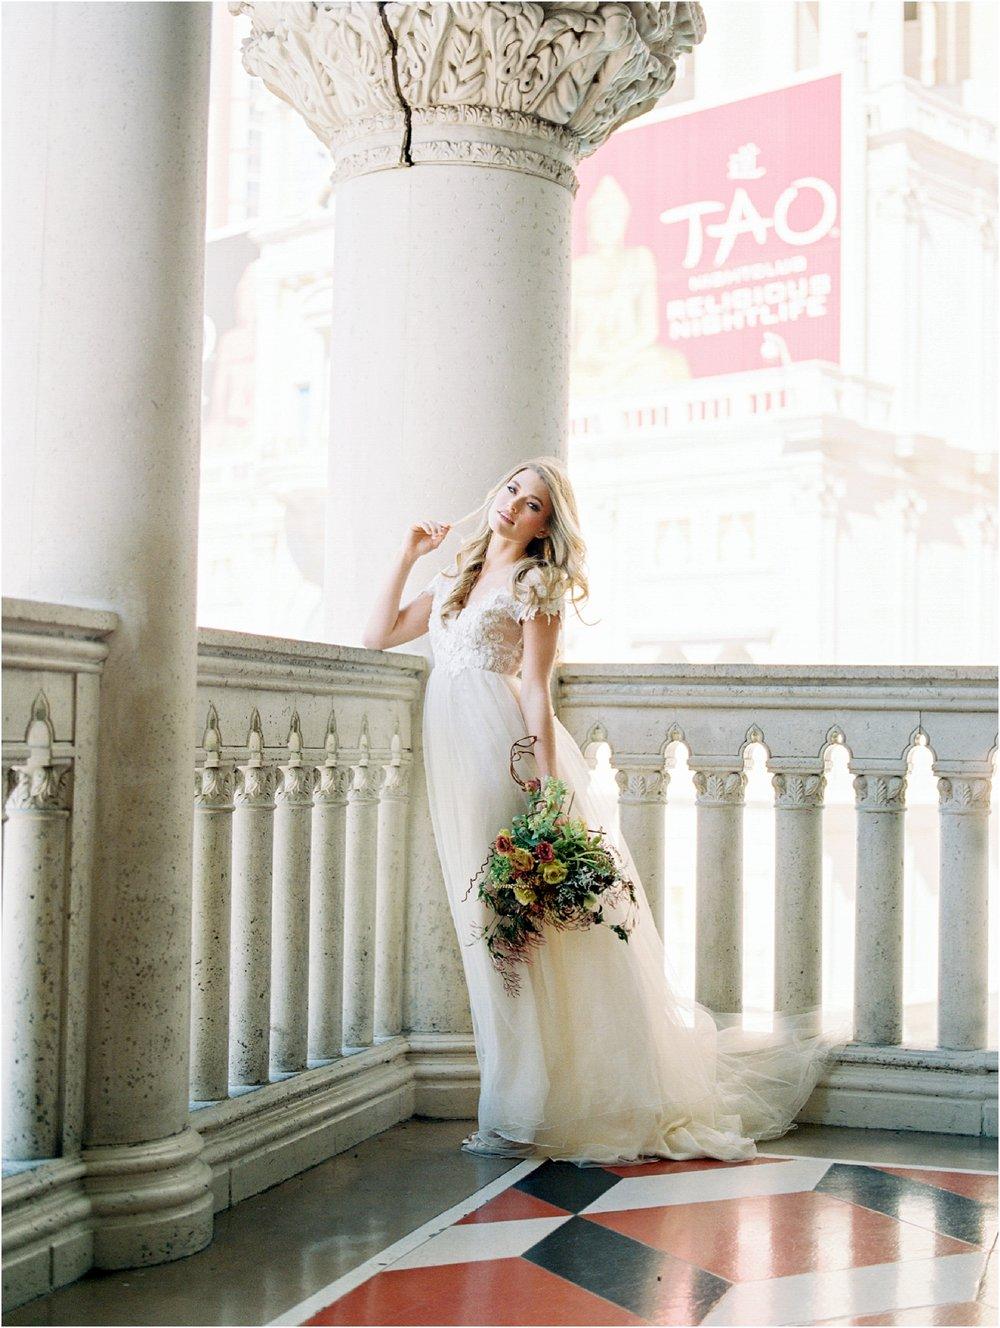 Lisa Silva Photography- Ponte Vedra Beach, St. Augustine and Jacksonville, Florida Fine Art Film Wedding and Boudoir Photography- Fine Art Film Bridal Editorial at the Venitian, Las Vegas_0000.jpg